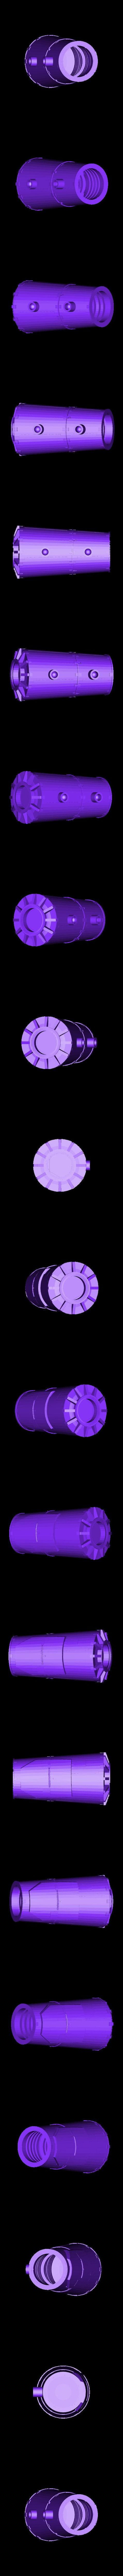 photometer.stl Download free STL file Kepler • 3D printer template, spac3D